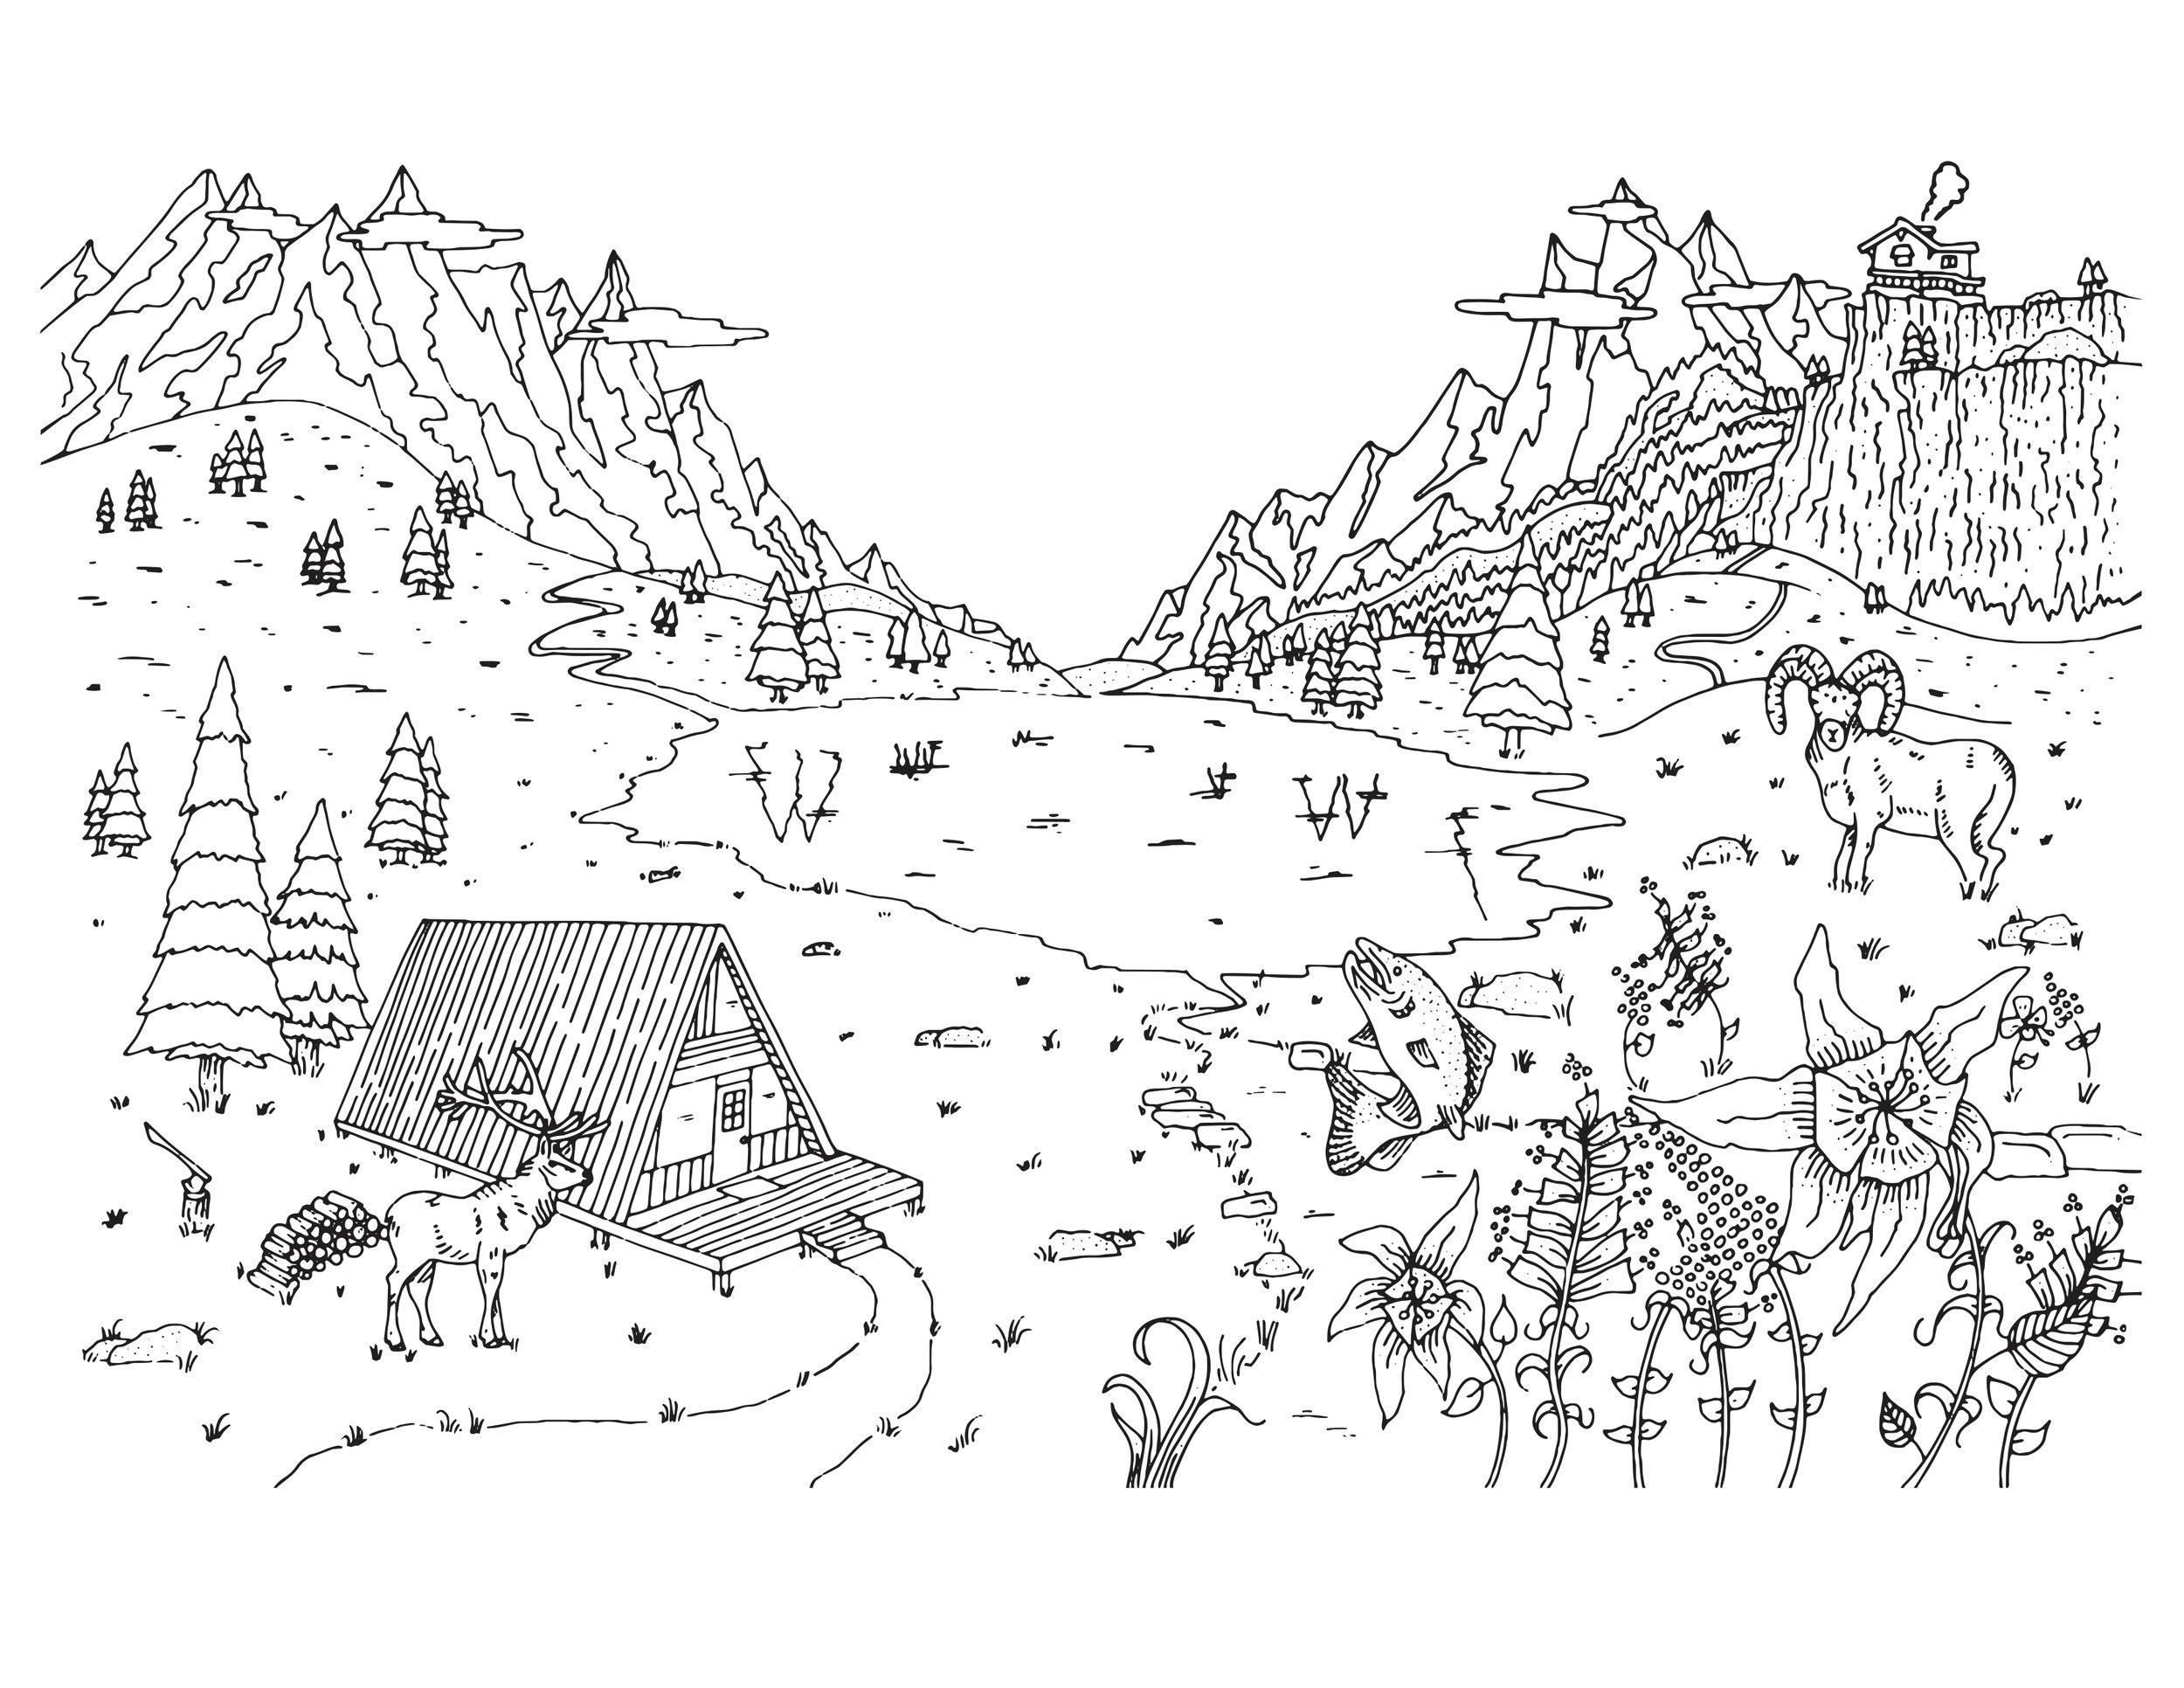 Illustration by Benten Woodring